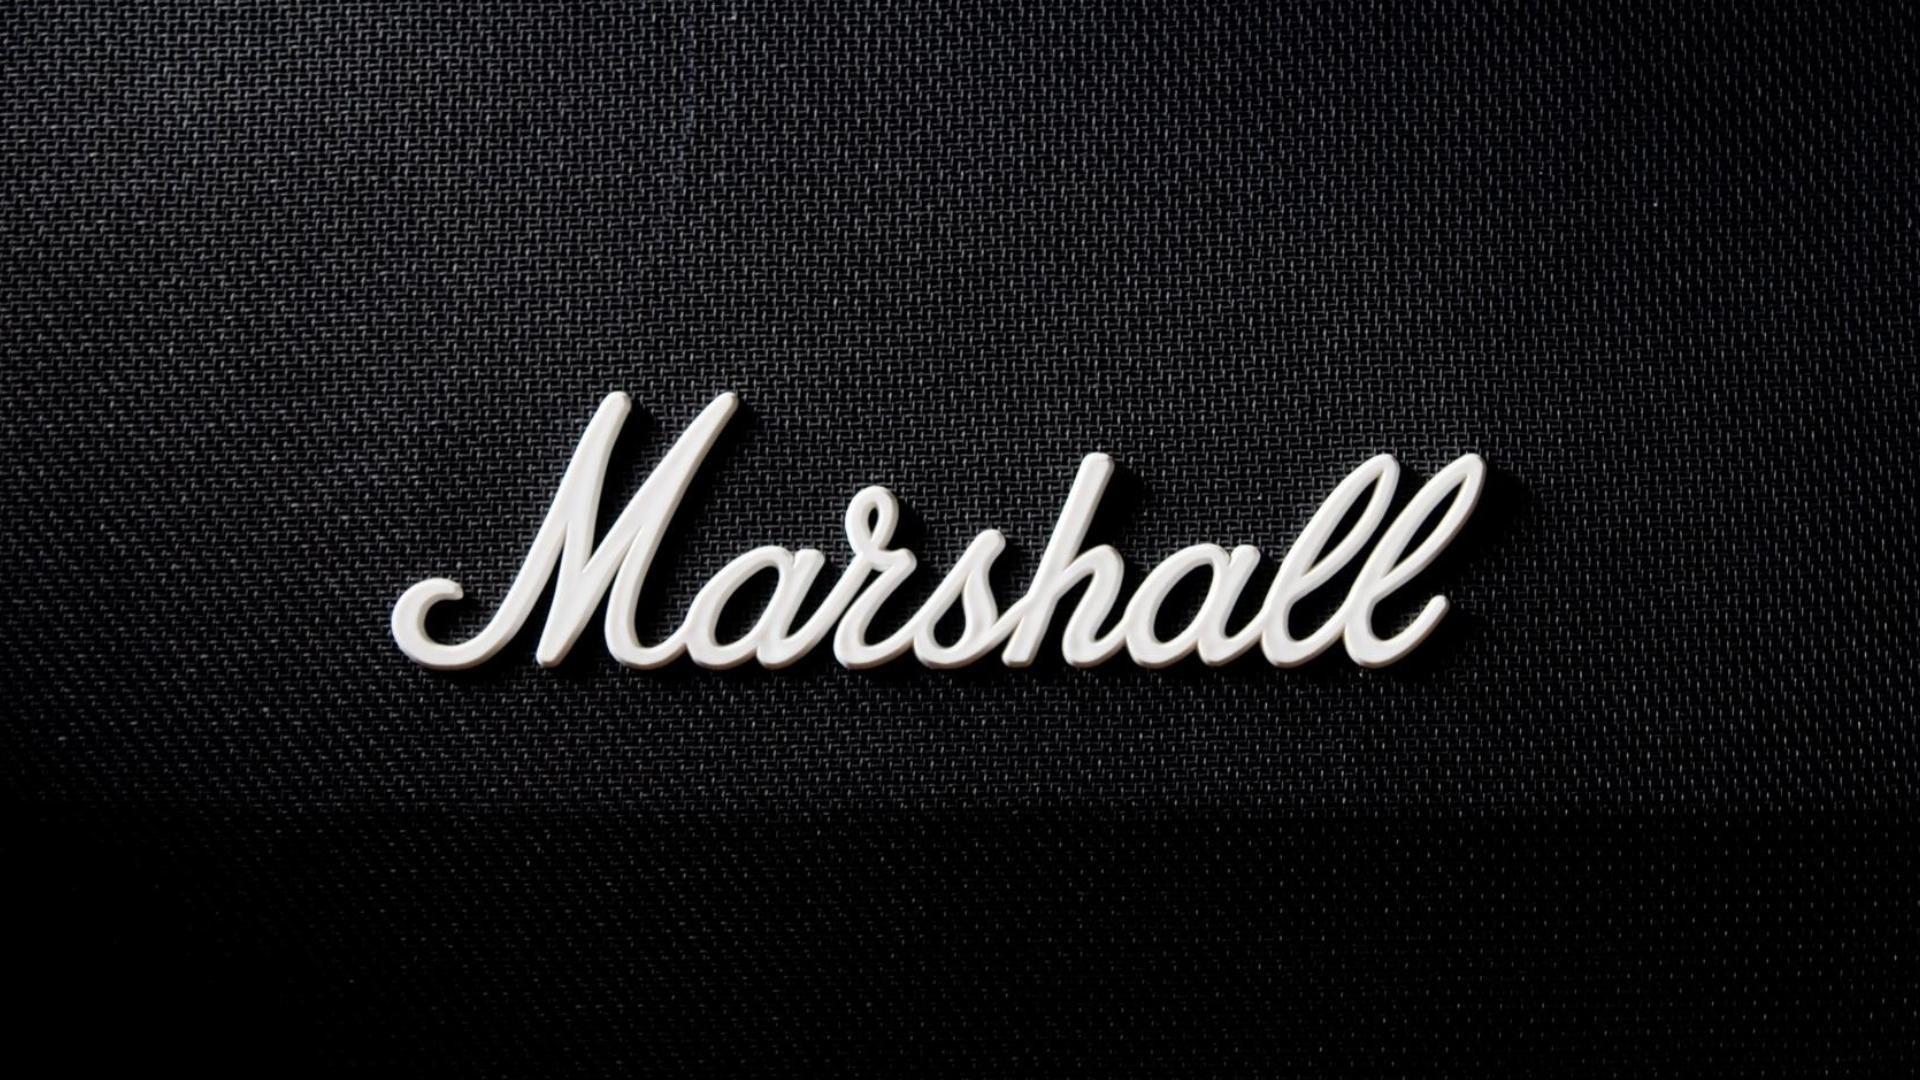 Marshall - 1920x1080